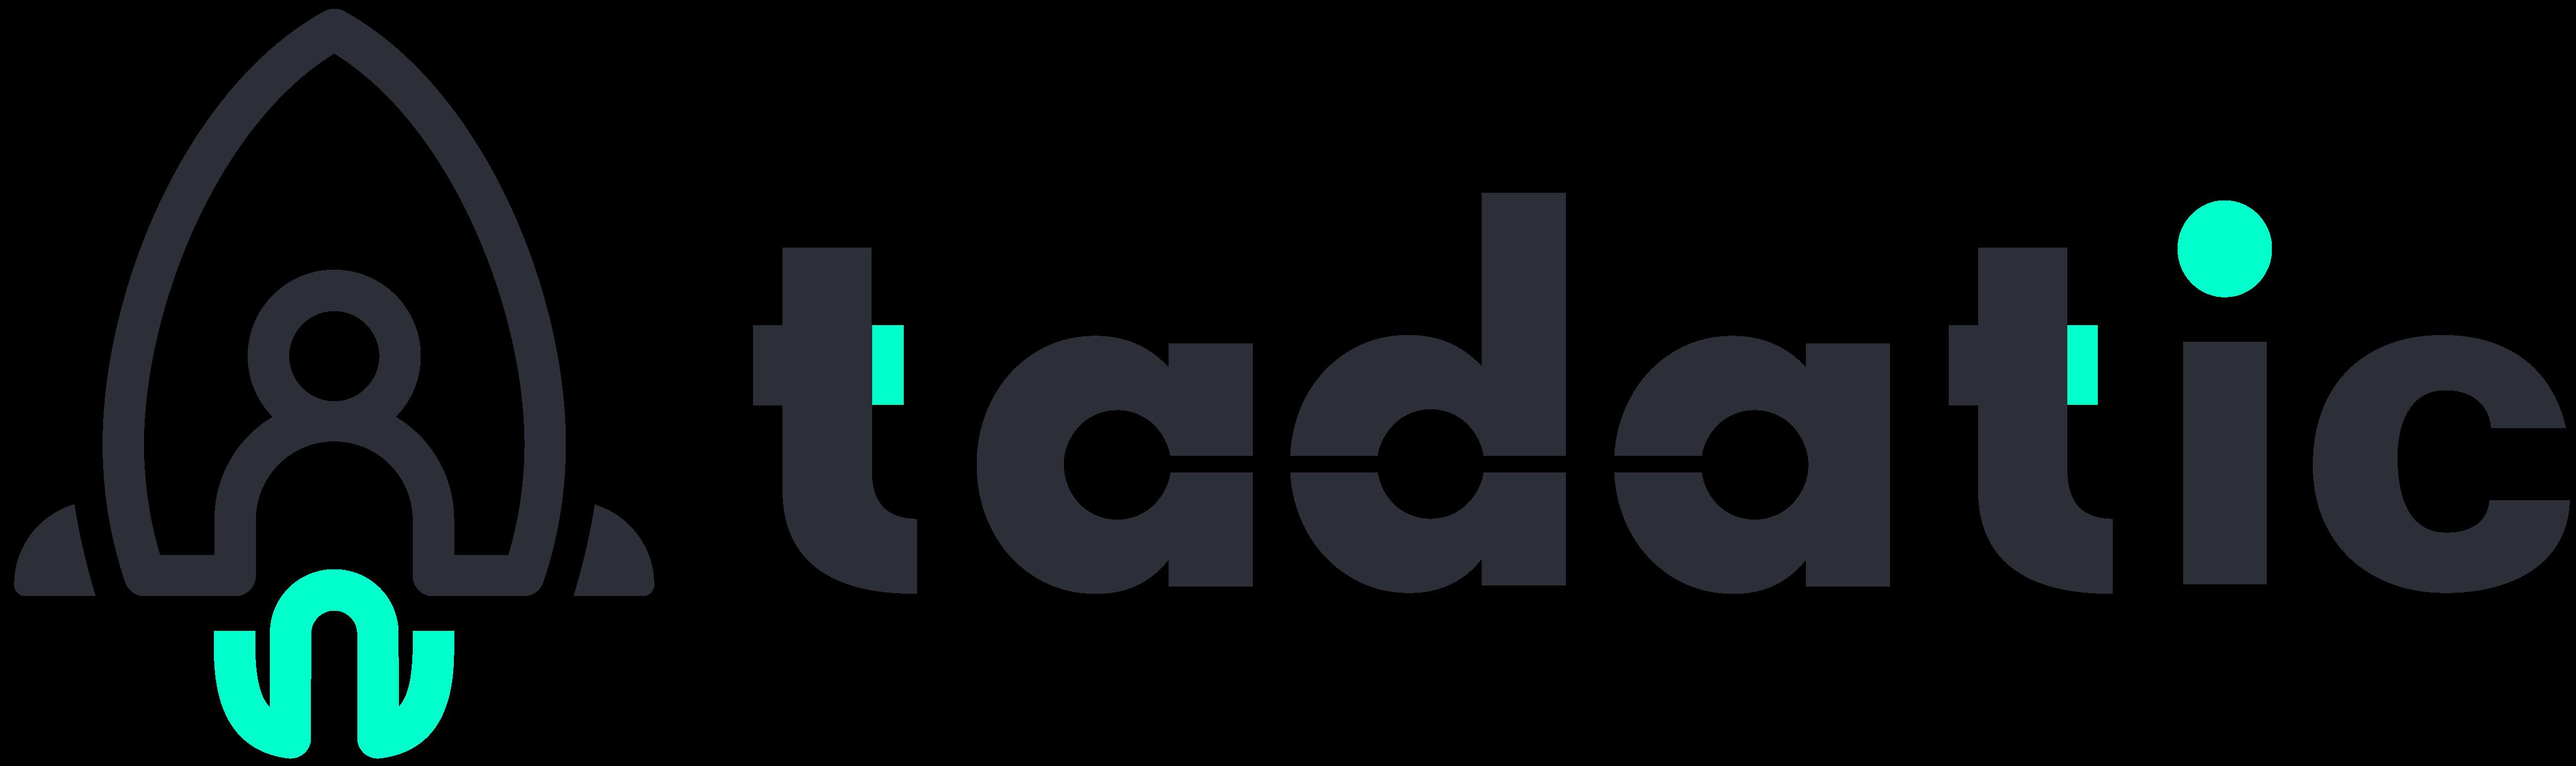 Icono de Tadatic